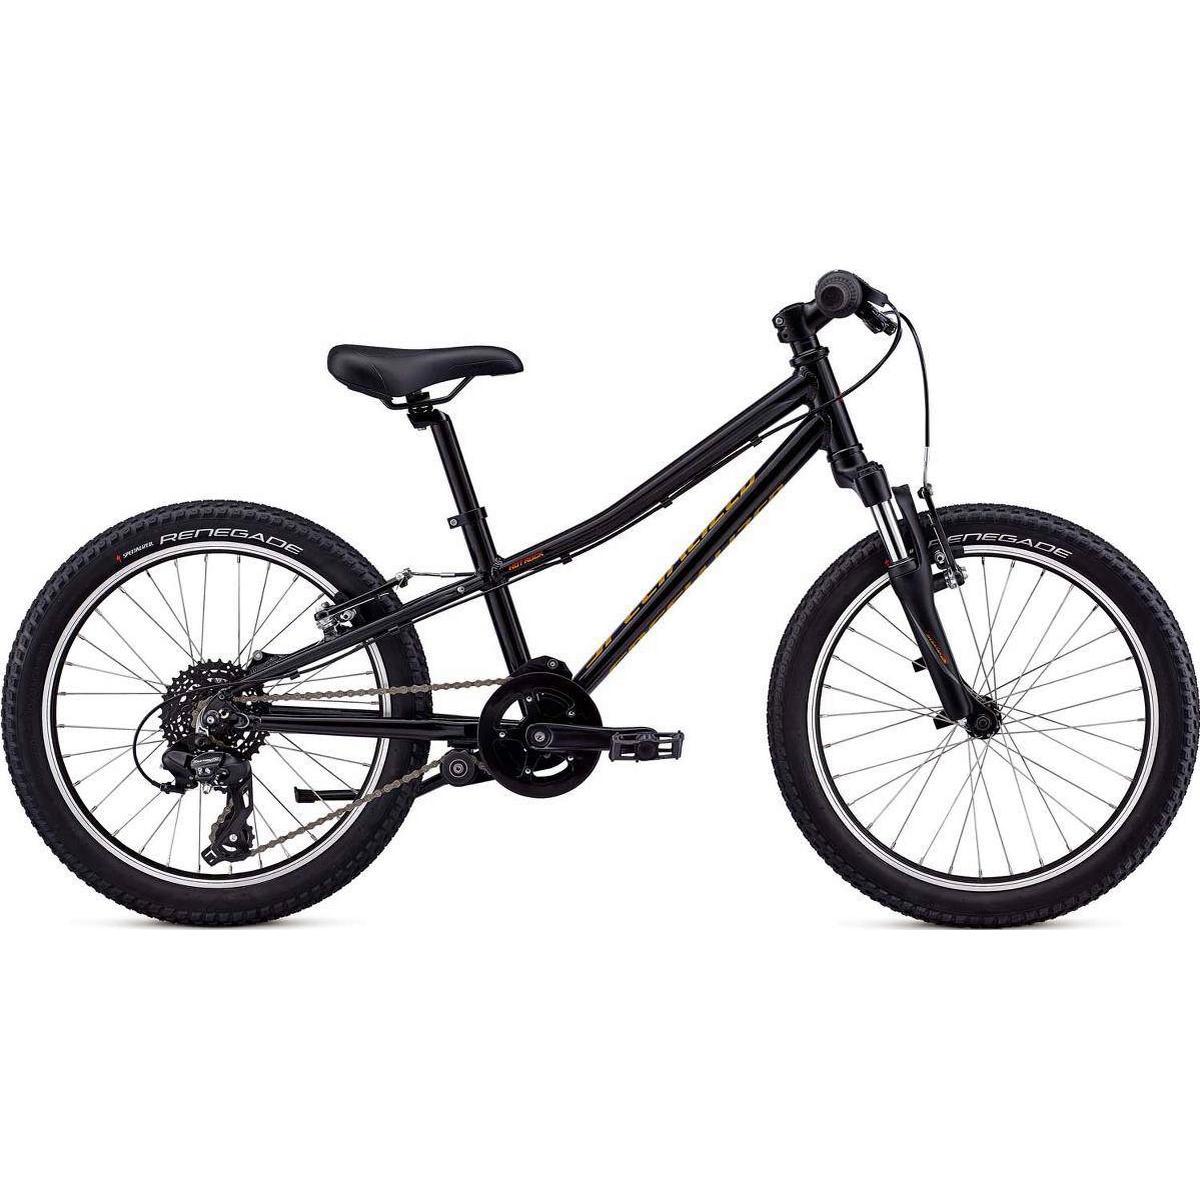 Raleigh cyklar dating